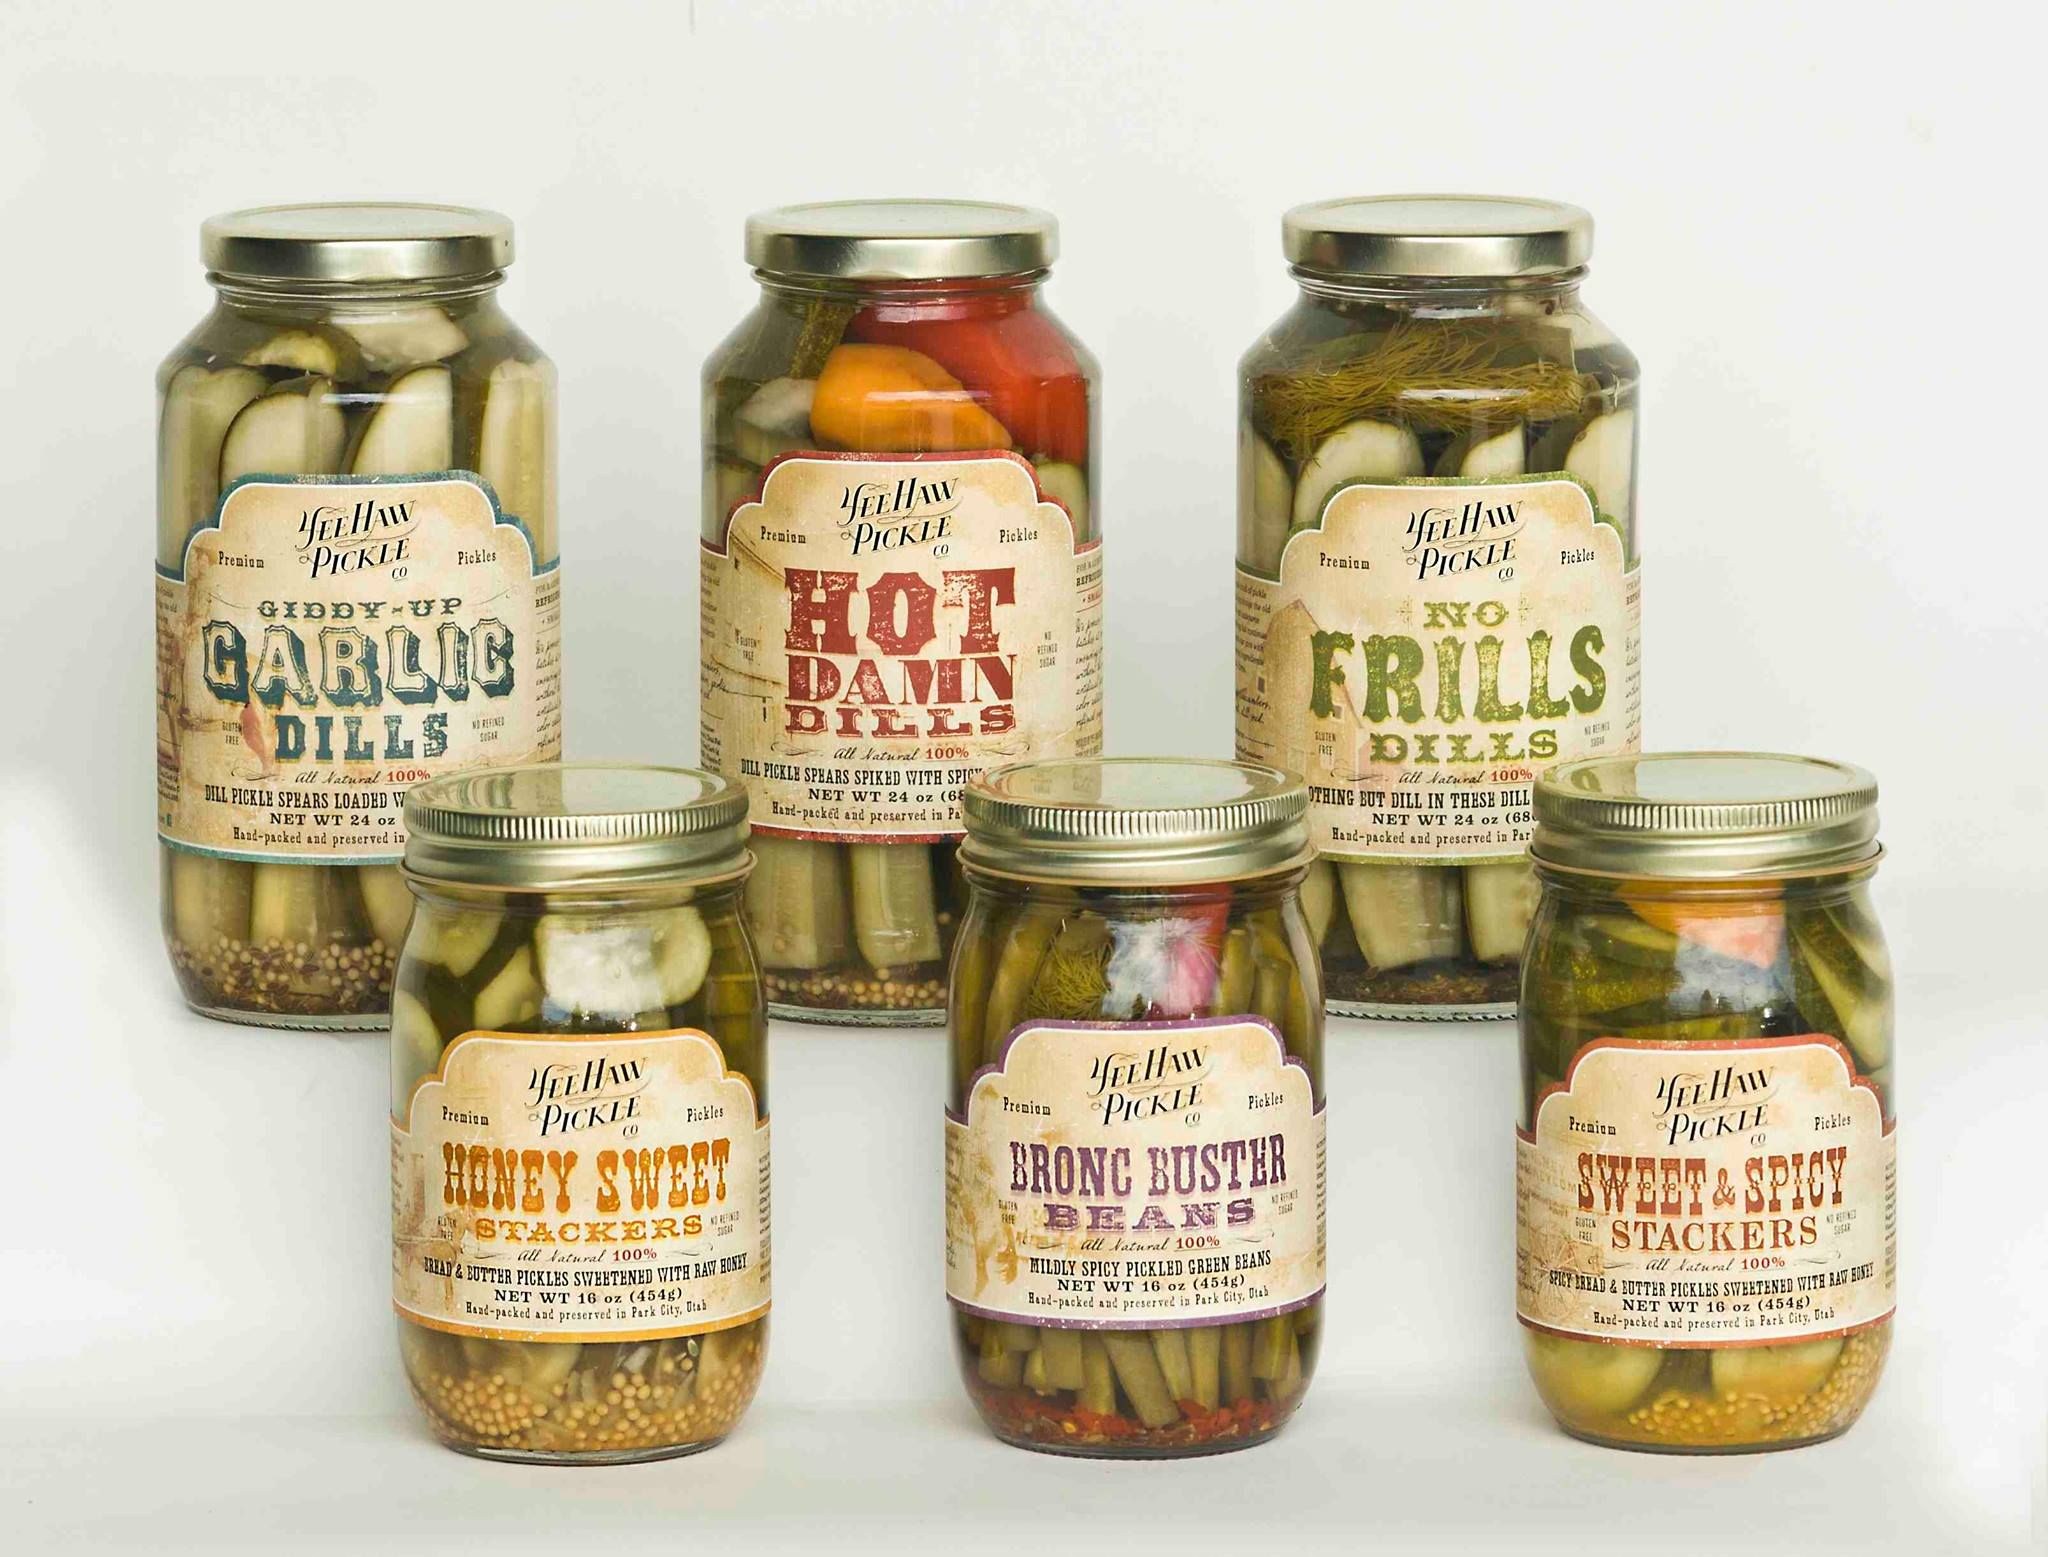 YeeHaw Pickle Sampler Giveaway